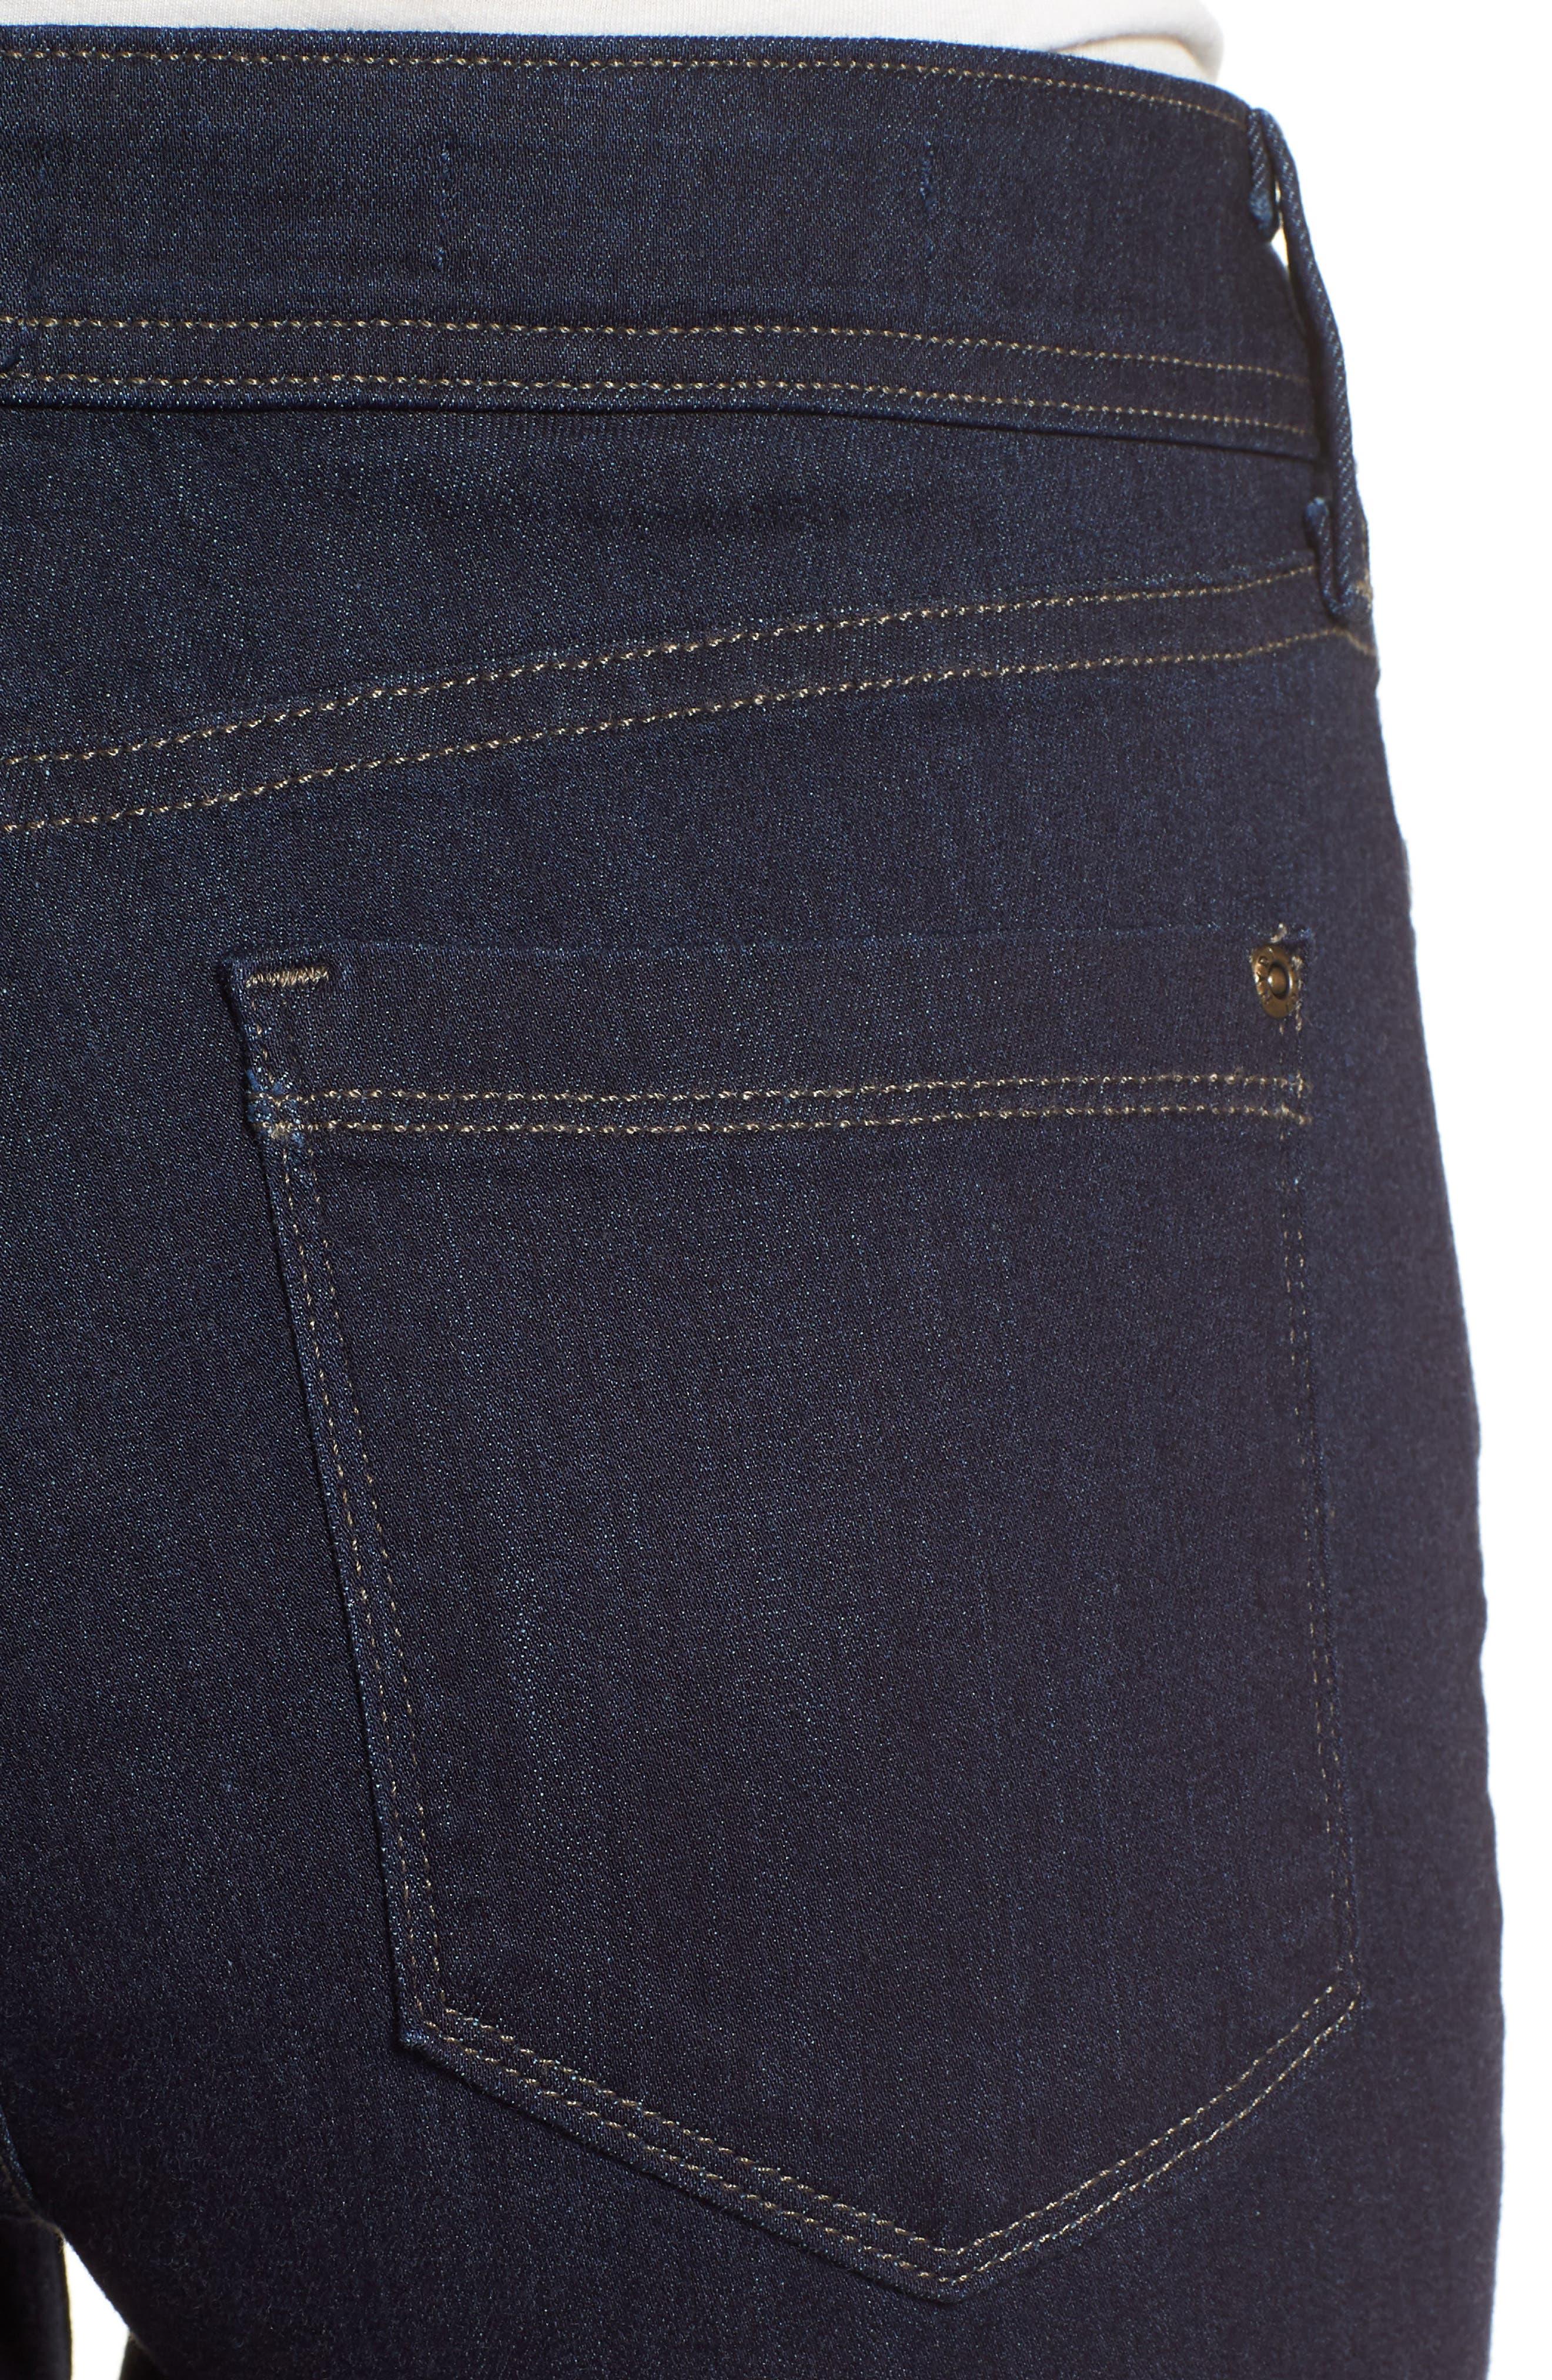 Billie Mini Bootcut Jeans,                             Alternate thumbnail 4, color,                             Mabel